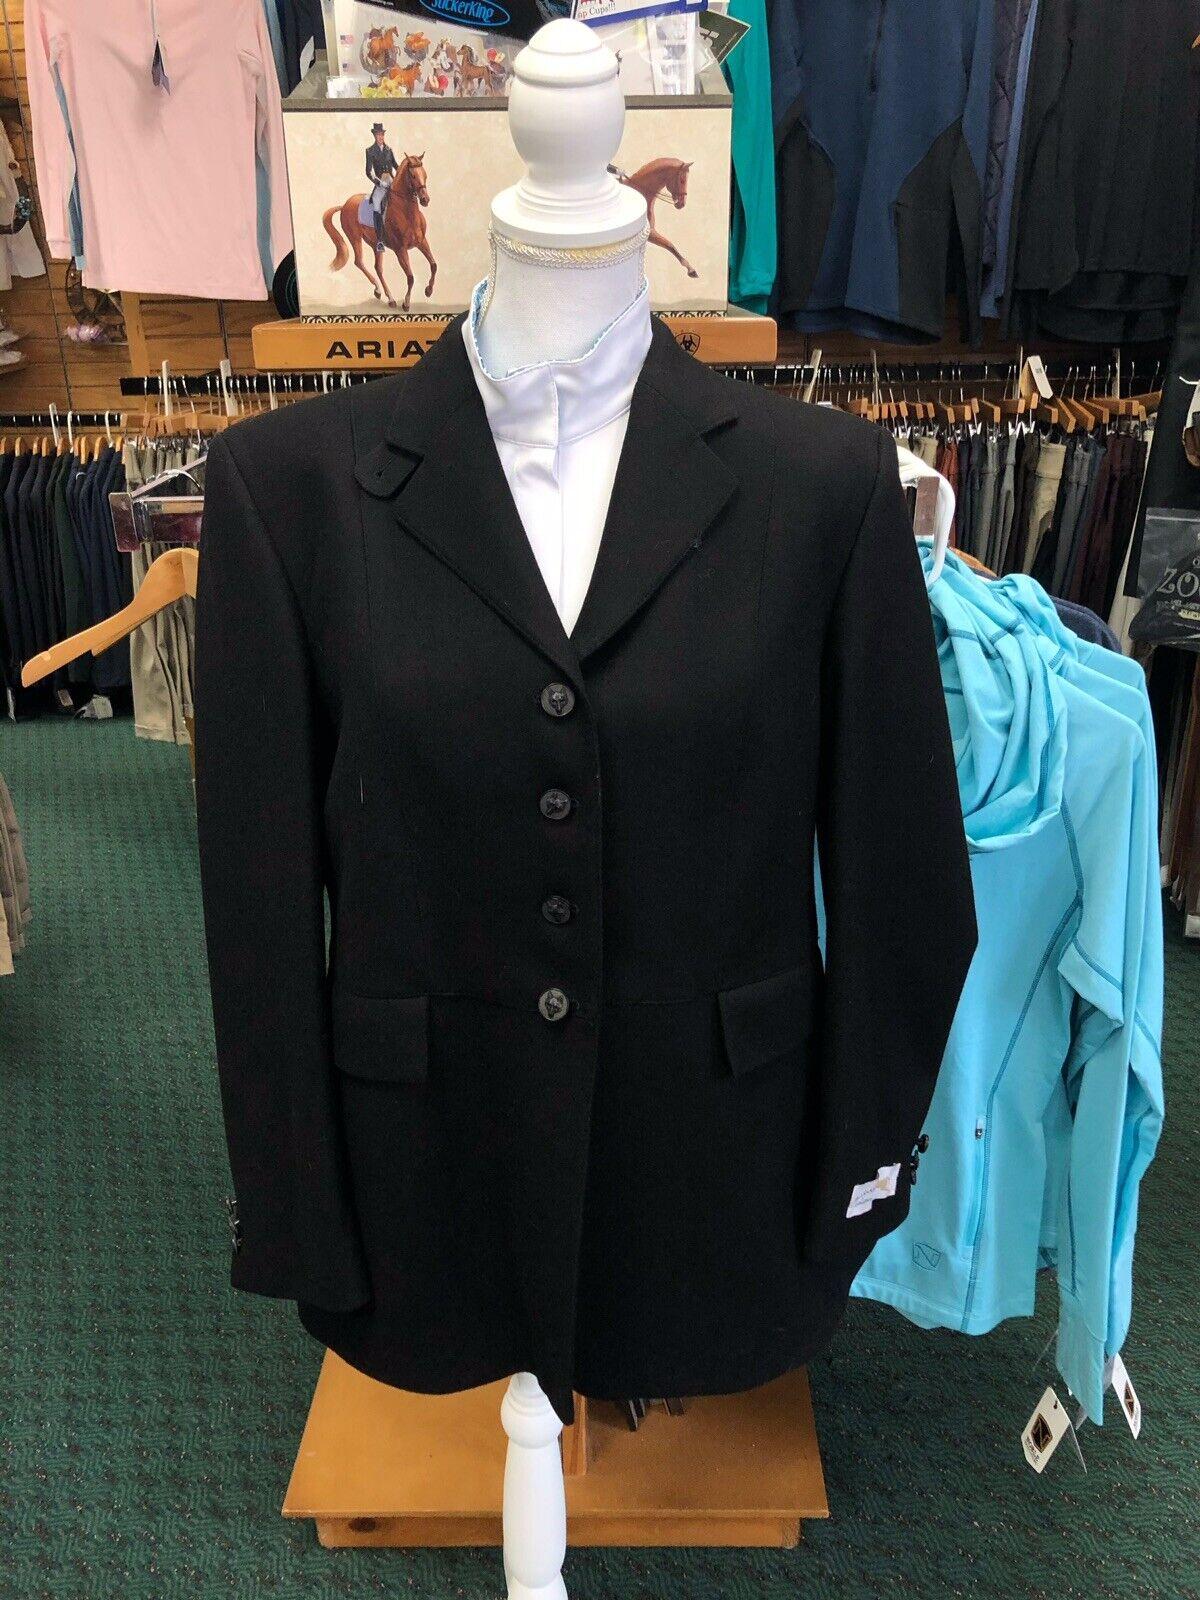 14R RJ classeic Piaffe Dress mostrare Coat